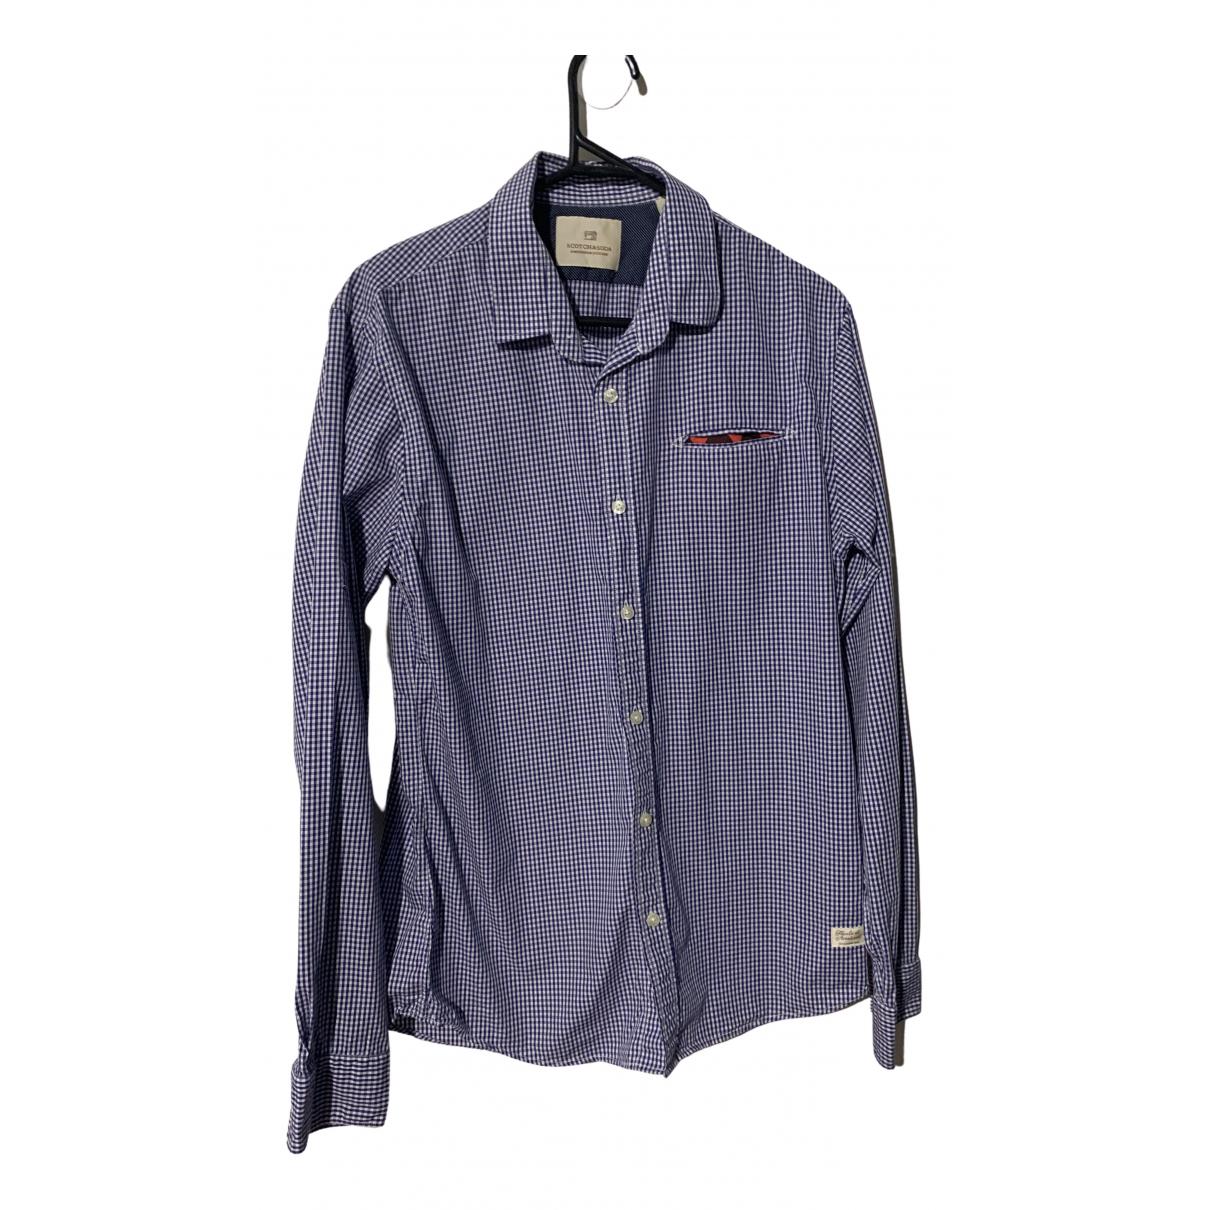 Scotch & Soda \N Blue Cotton Shirts for Men M International